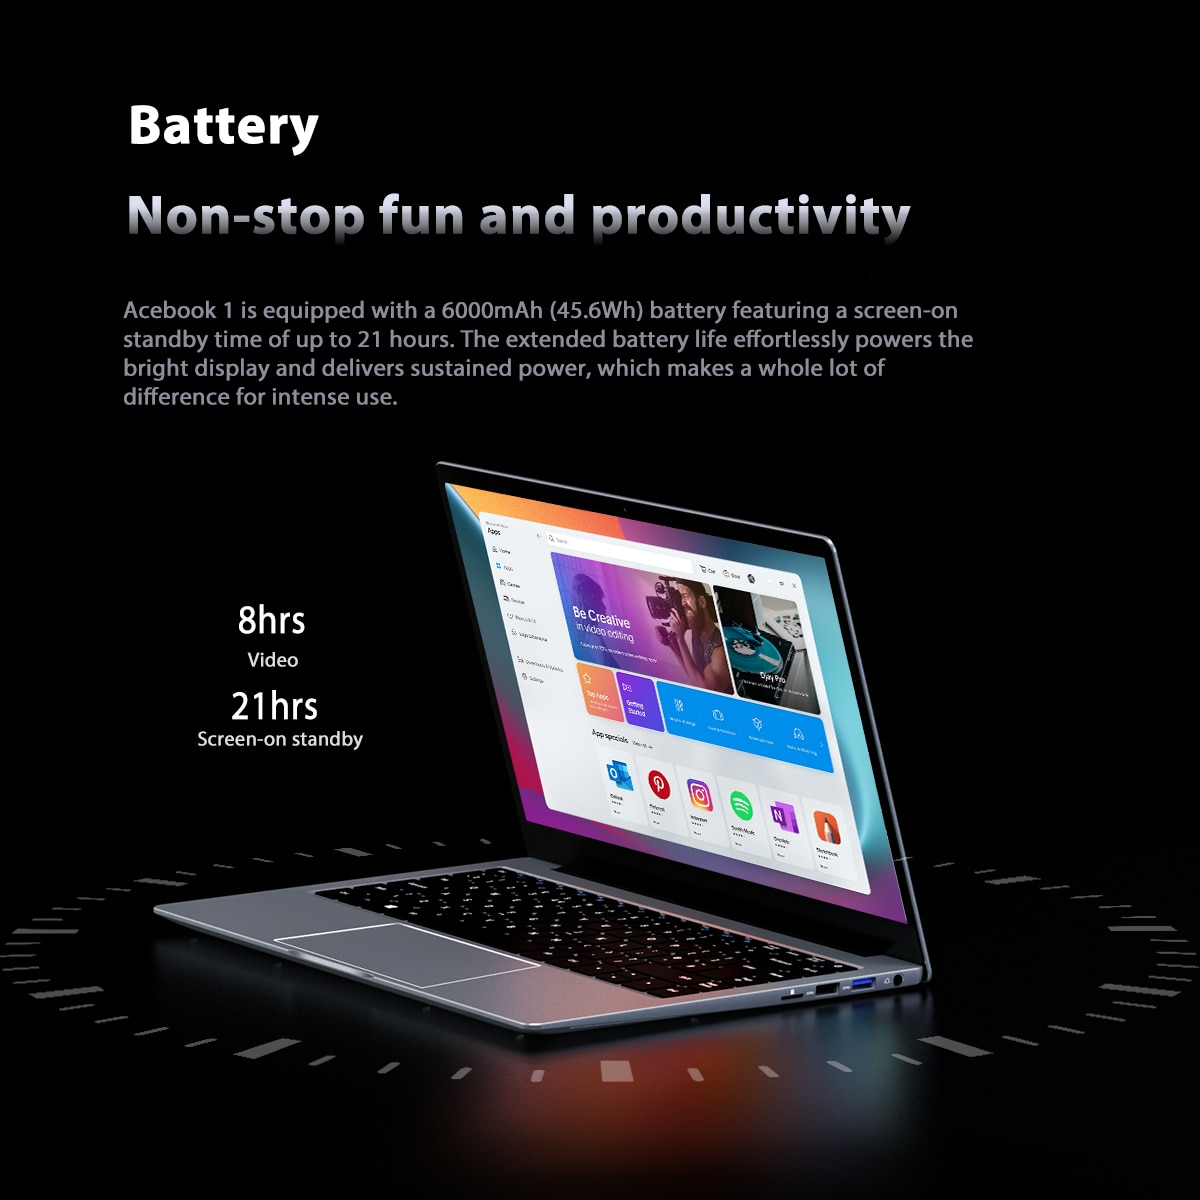 Blackview Acebook 1 Laptop 14 inch FHD 1920*1080 Display Windows 10 128GB ROM Intel Gemini Lake N4120 Notebook Students Computer